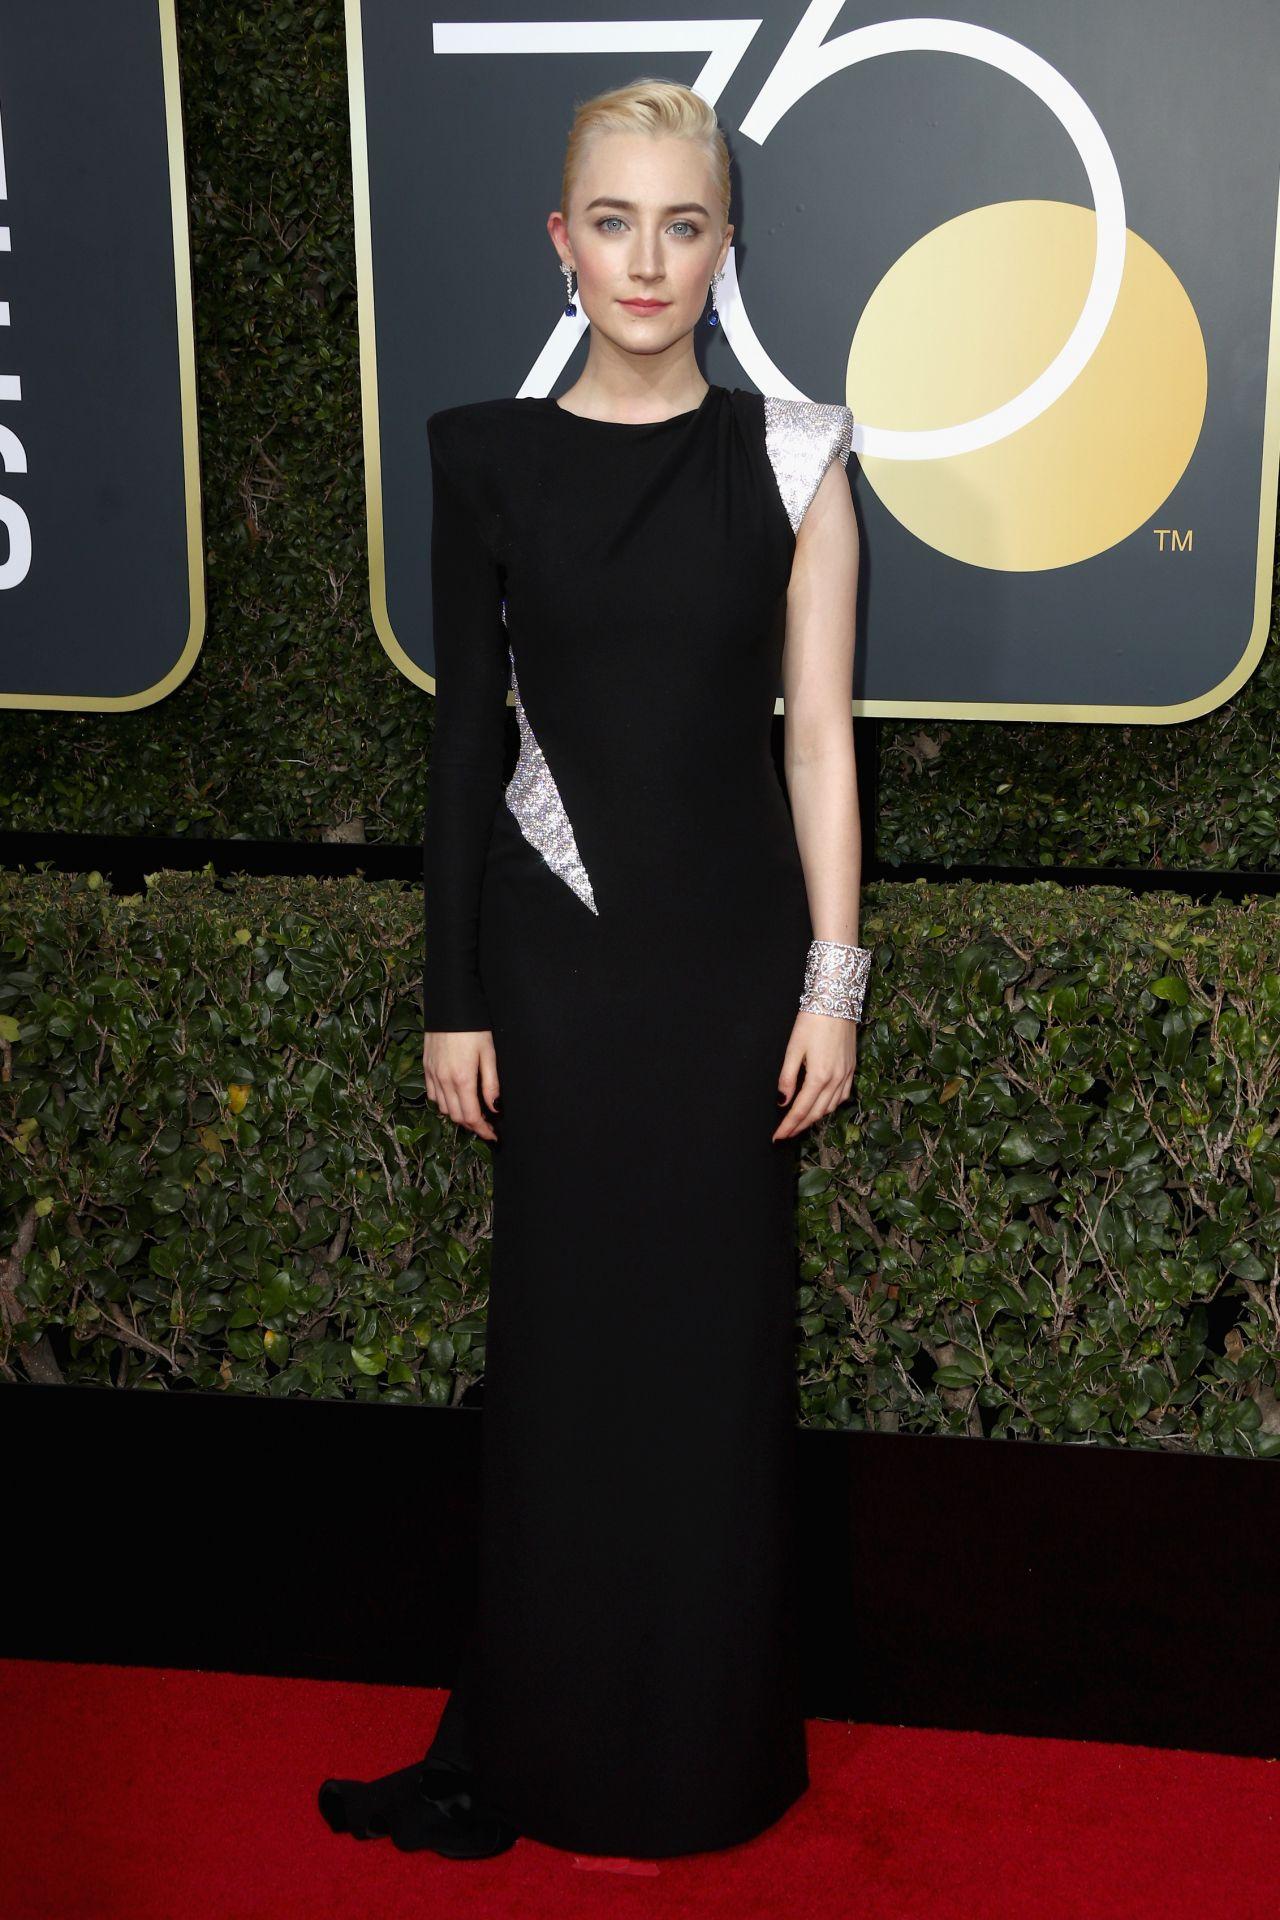 http://celebmafia.com/wp-content/uploads/2018/01/saoirse-ronan-golden-globe-awards-2018-6.jpg